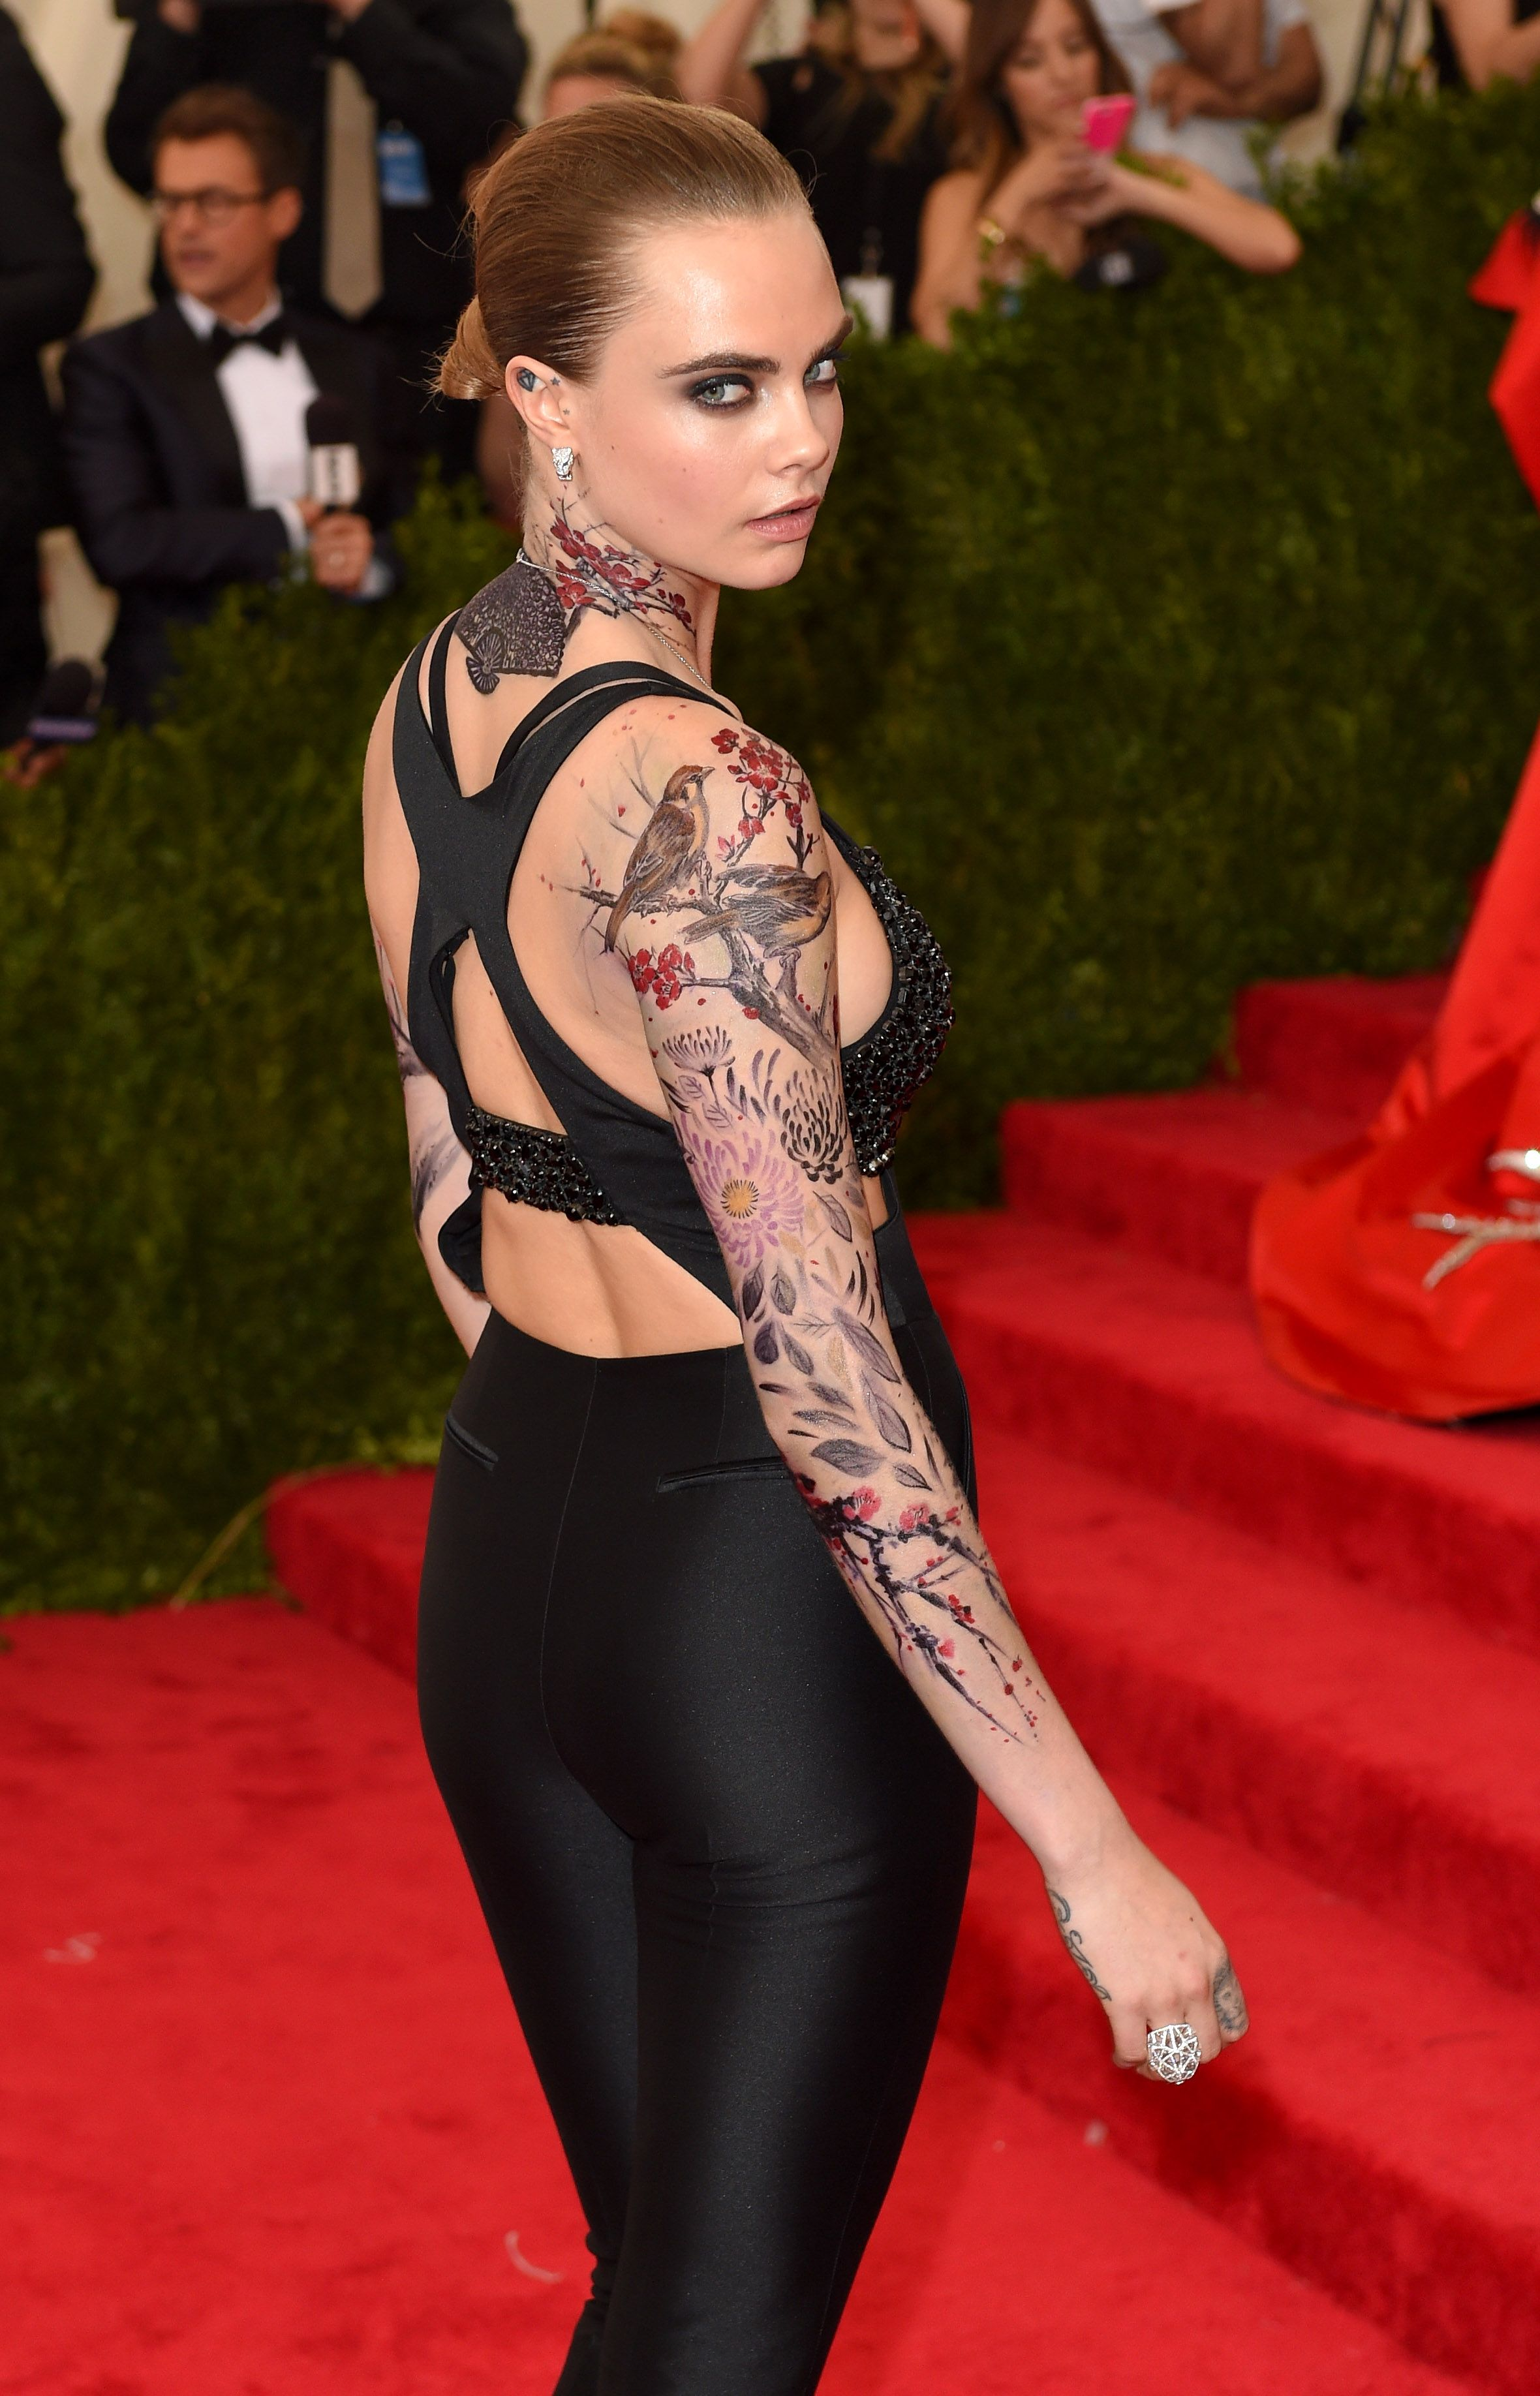 Cara Delevingne Google Search Celebrity tattoos, Full